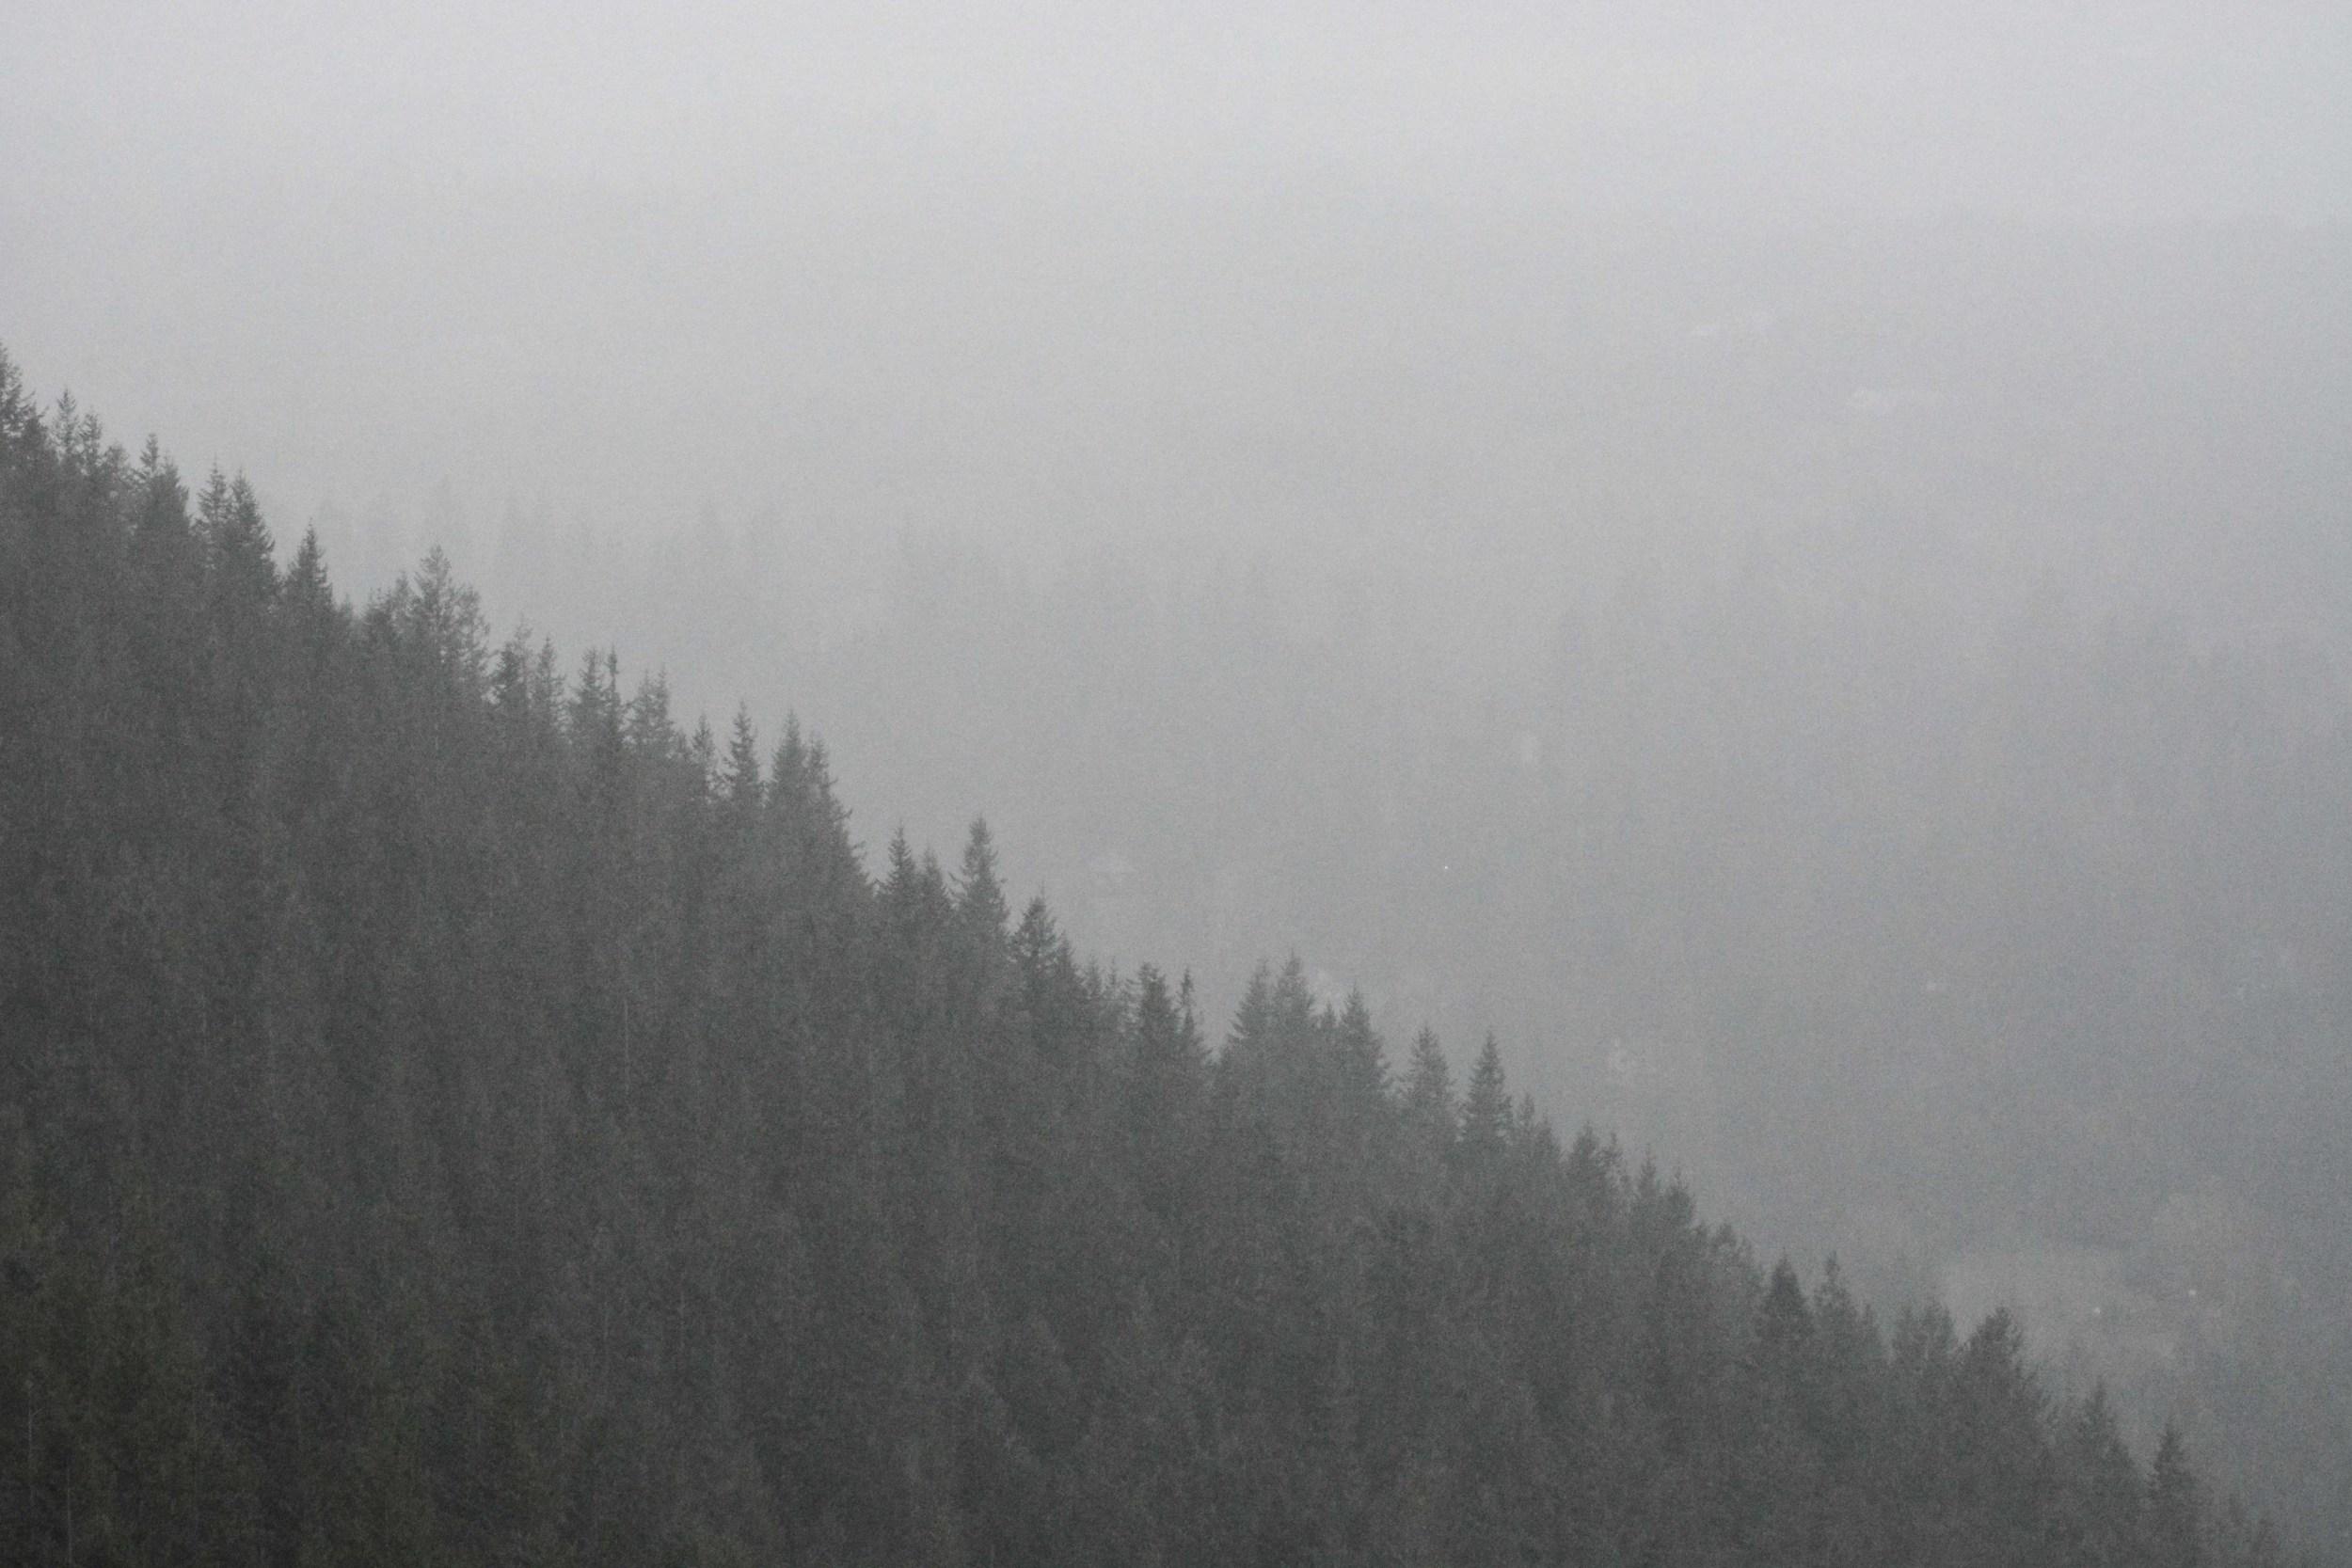 Evergreens in the Fog